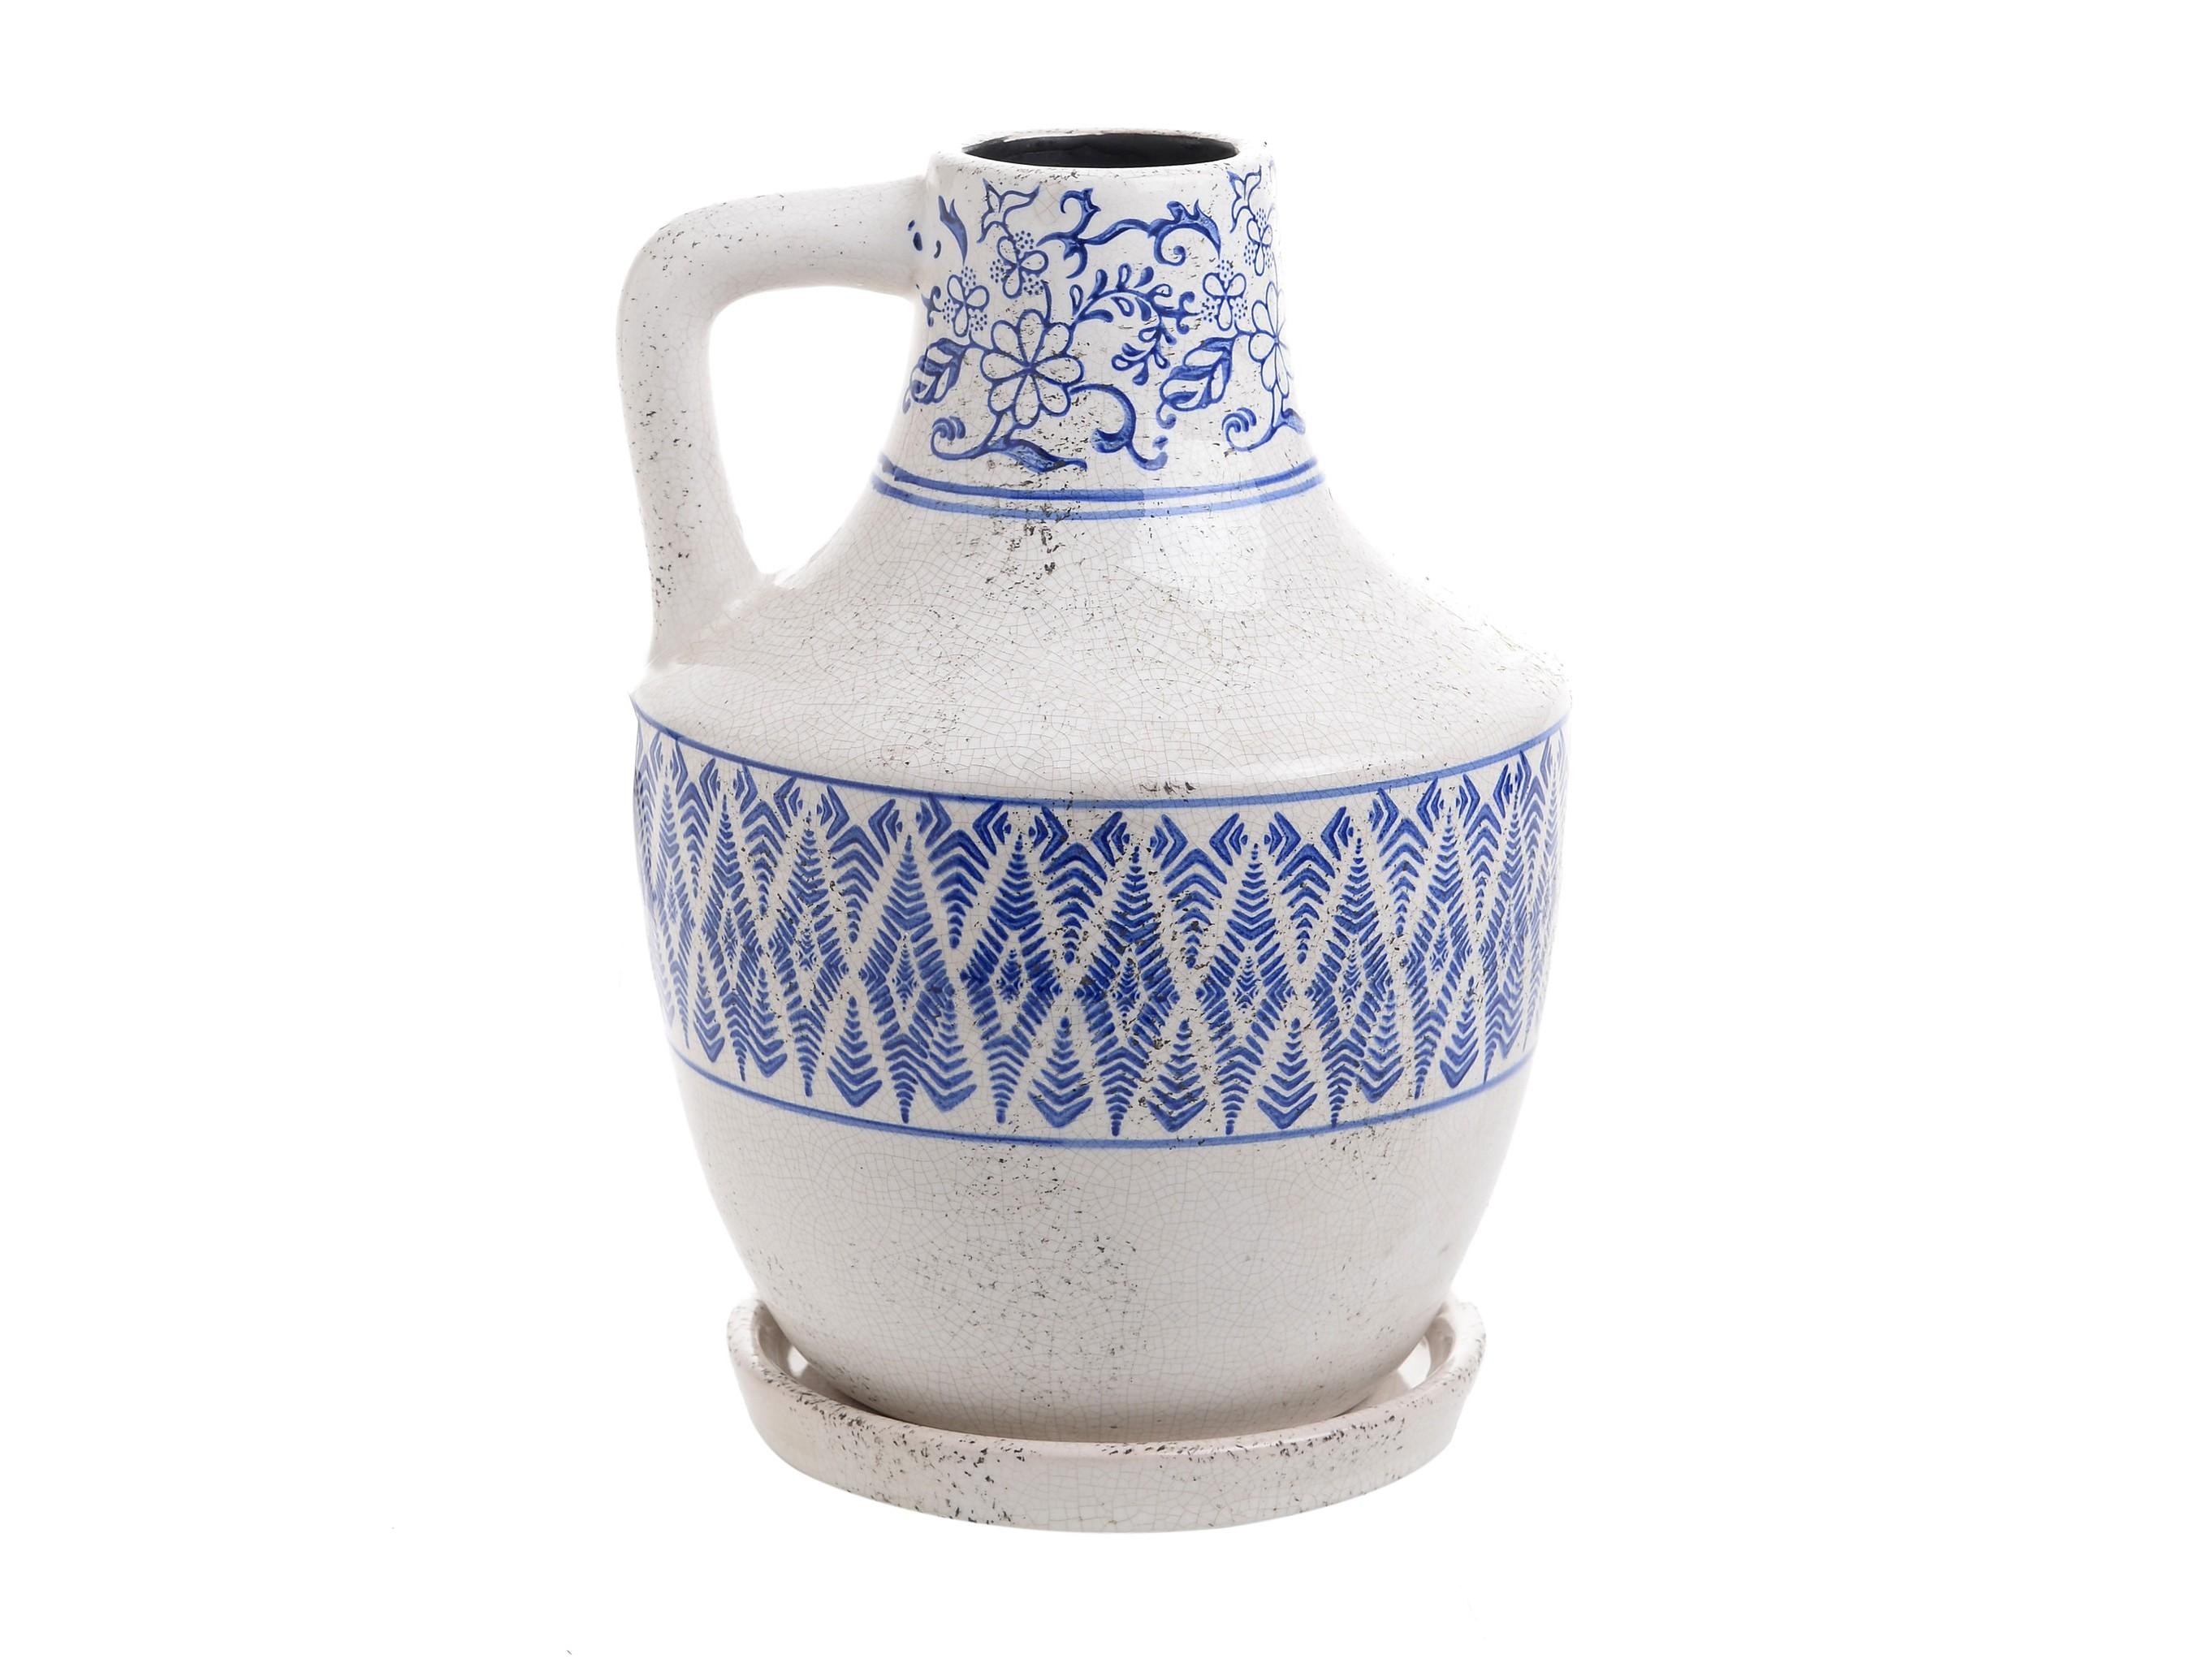 Ваза TodorВазы<br><br><br>Material: Керамика<br>Ширина см: 18.0<br>Высота см: 27.0<br>Глубина см: 18.0